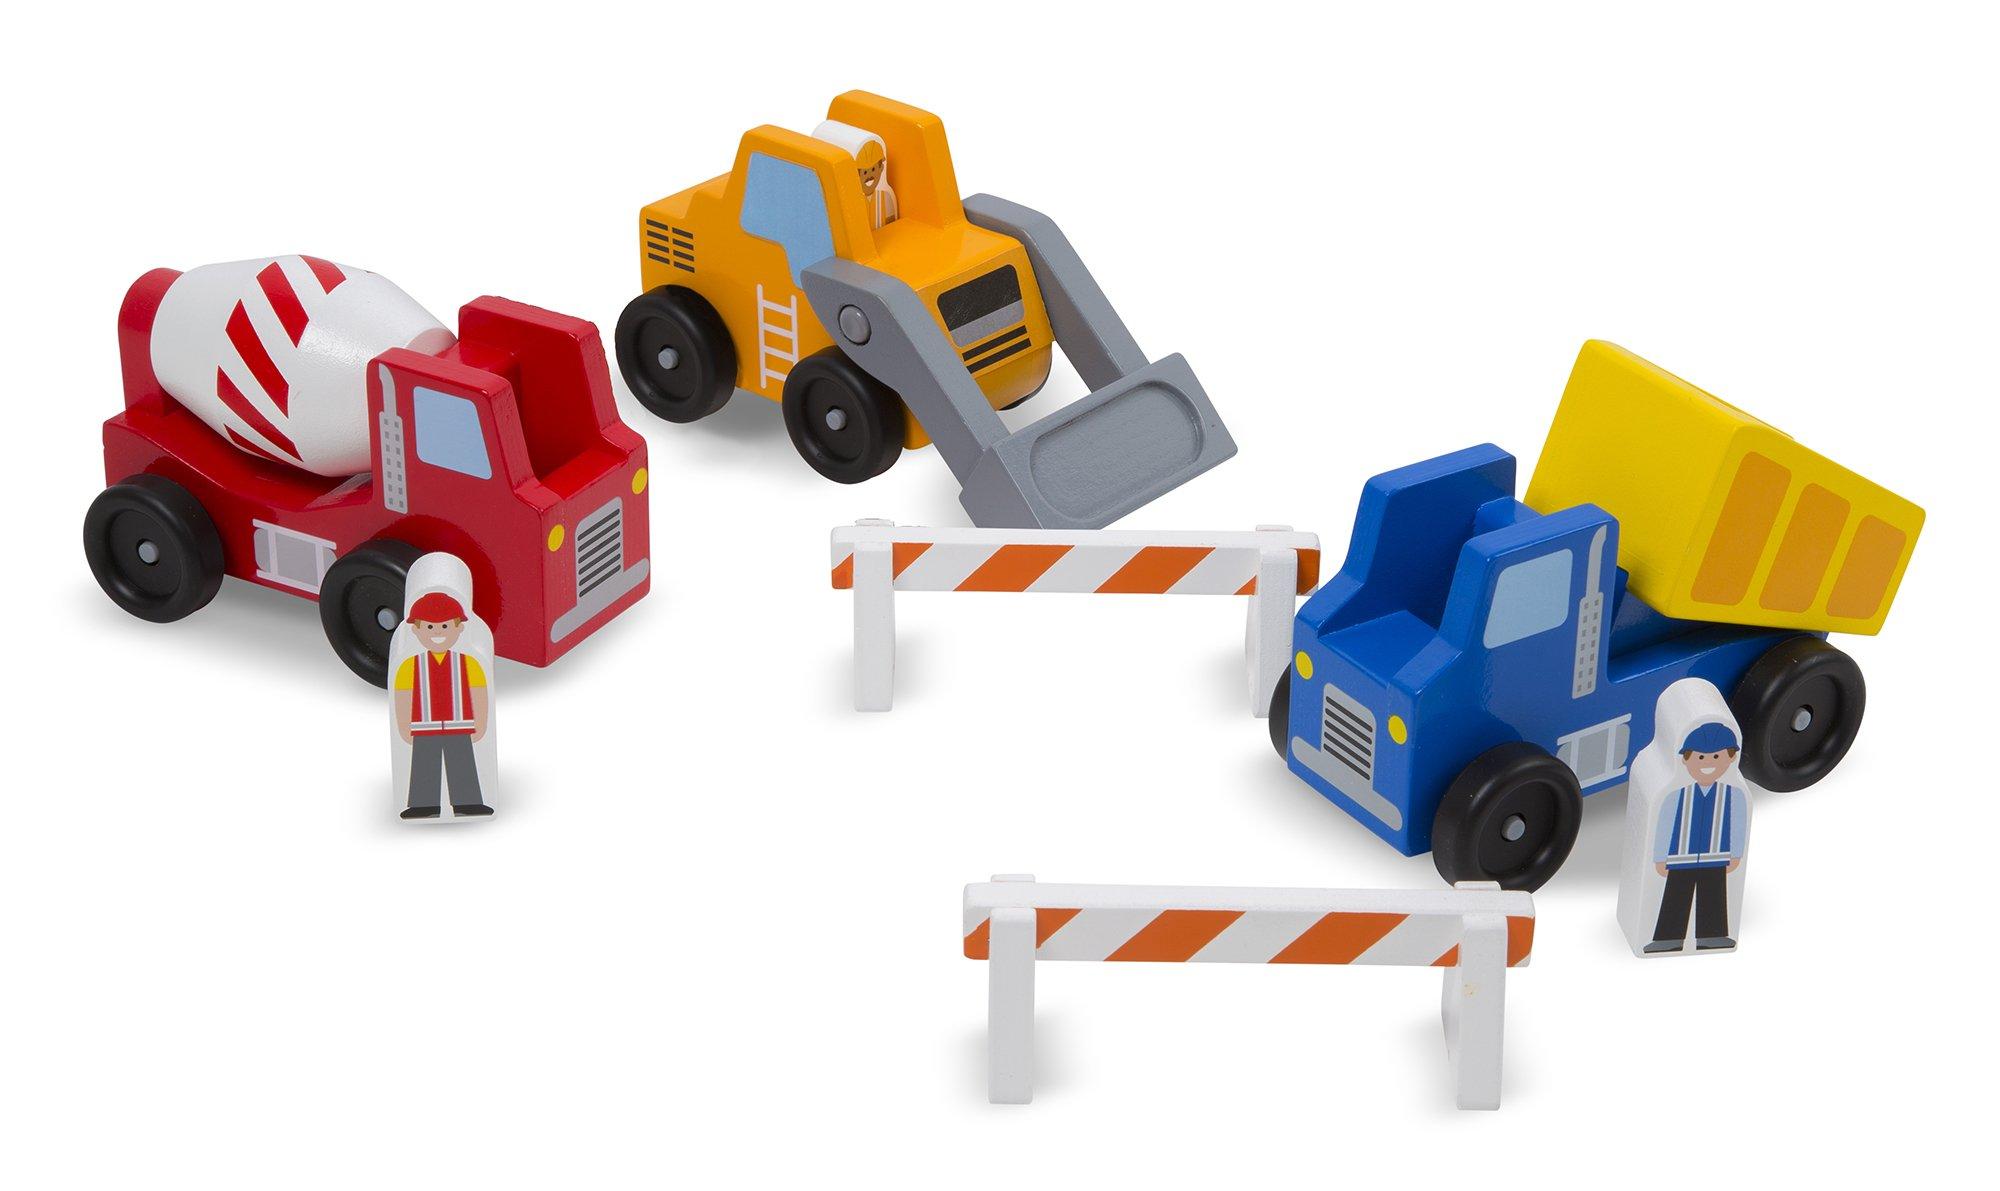 Construction Play Toys : Melissa doug construction vehicle wooden play set pcs